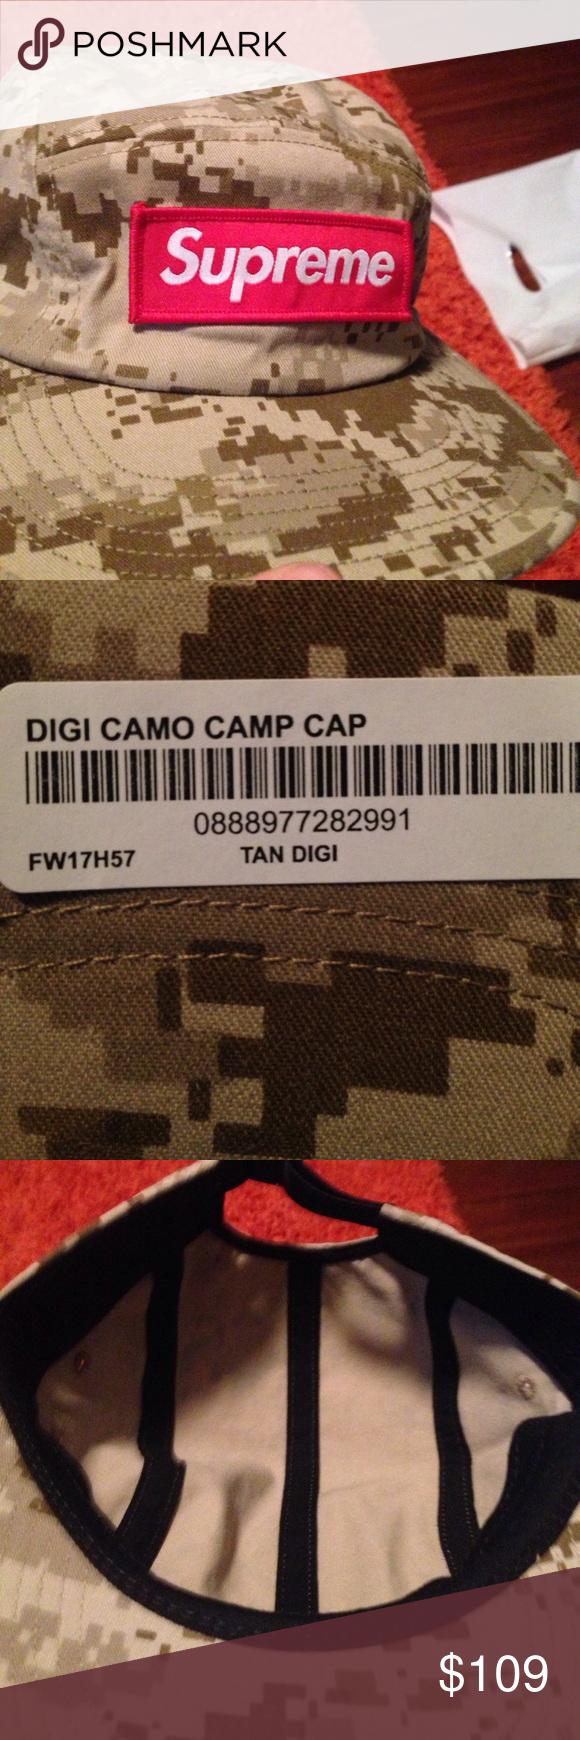 Camo Supreme hat DIGI CAMO CAMP CAP! Red box logo! 100% legit. Supreme  Accessories Hats 28675b9326f